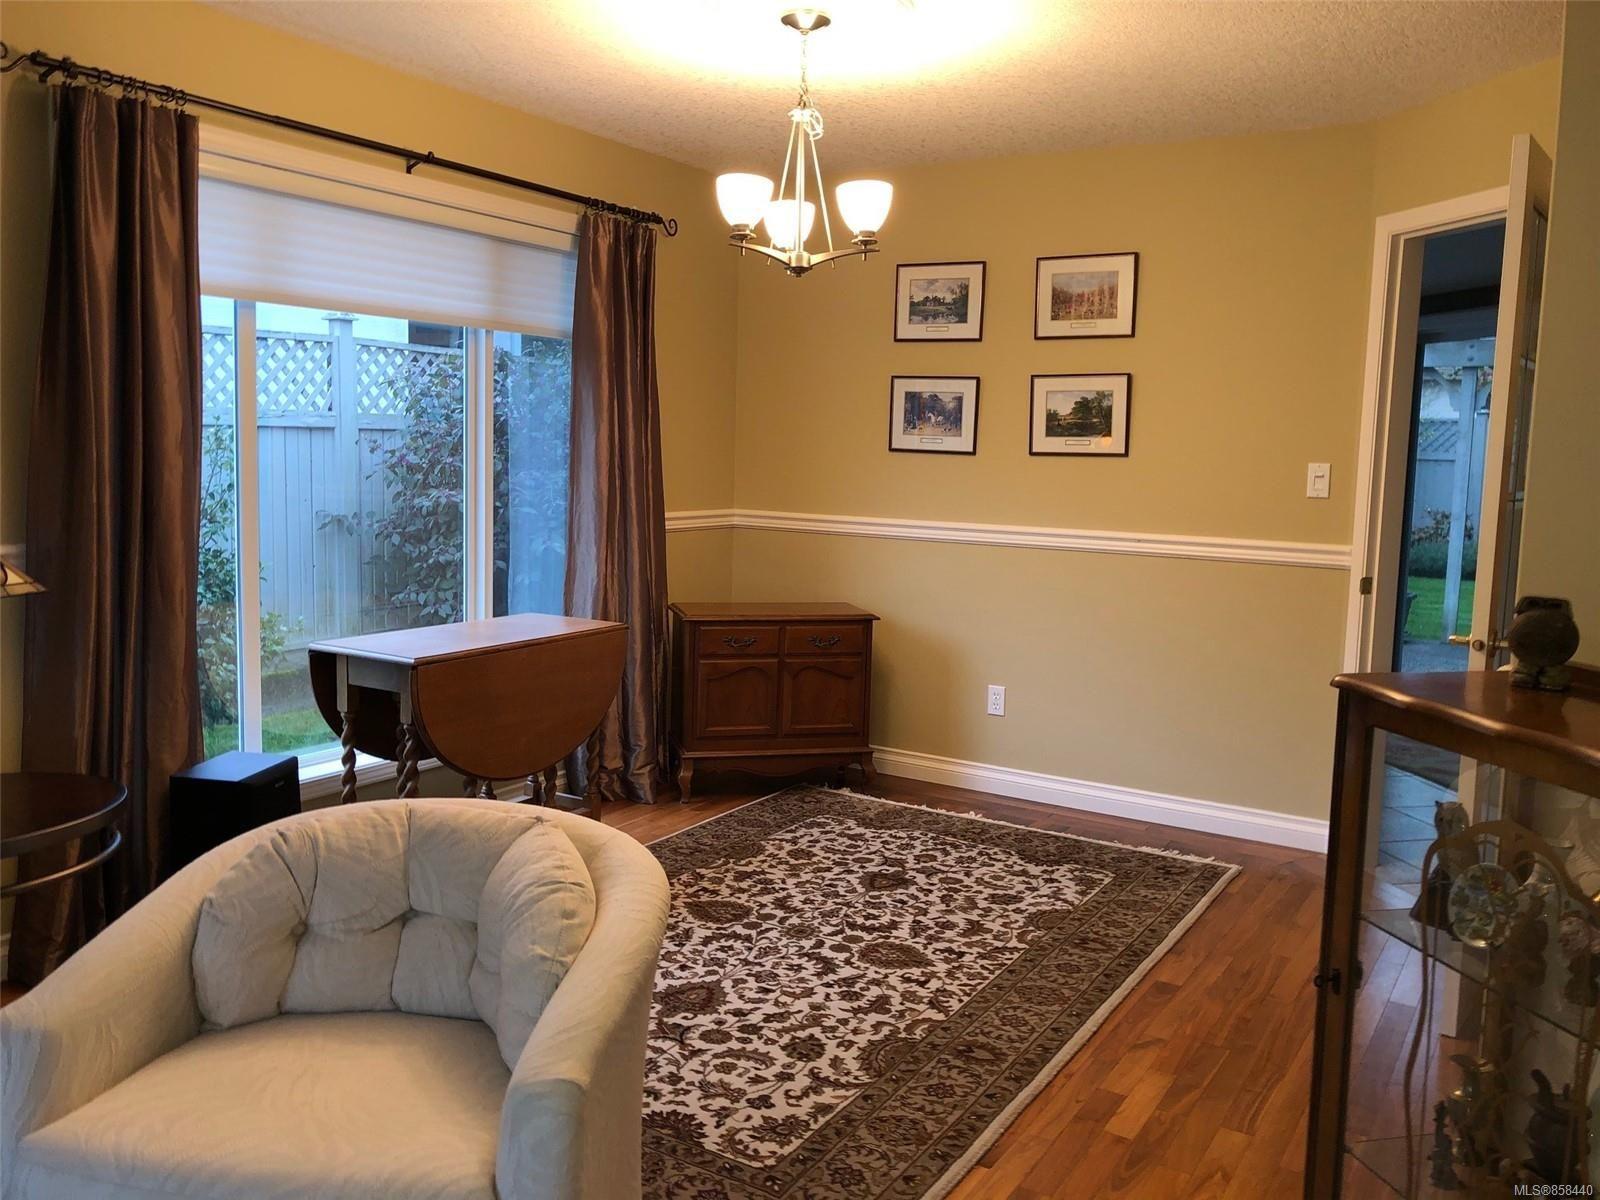 Photo 4: Photos: 798 Devon Pl in : PQ Qualicum Beach House for sale (Parksville/Qualicum)  : MLS®# 858440